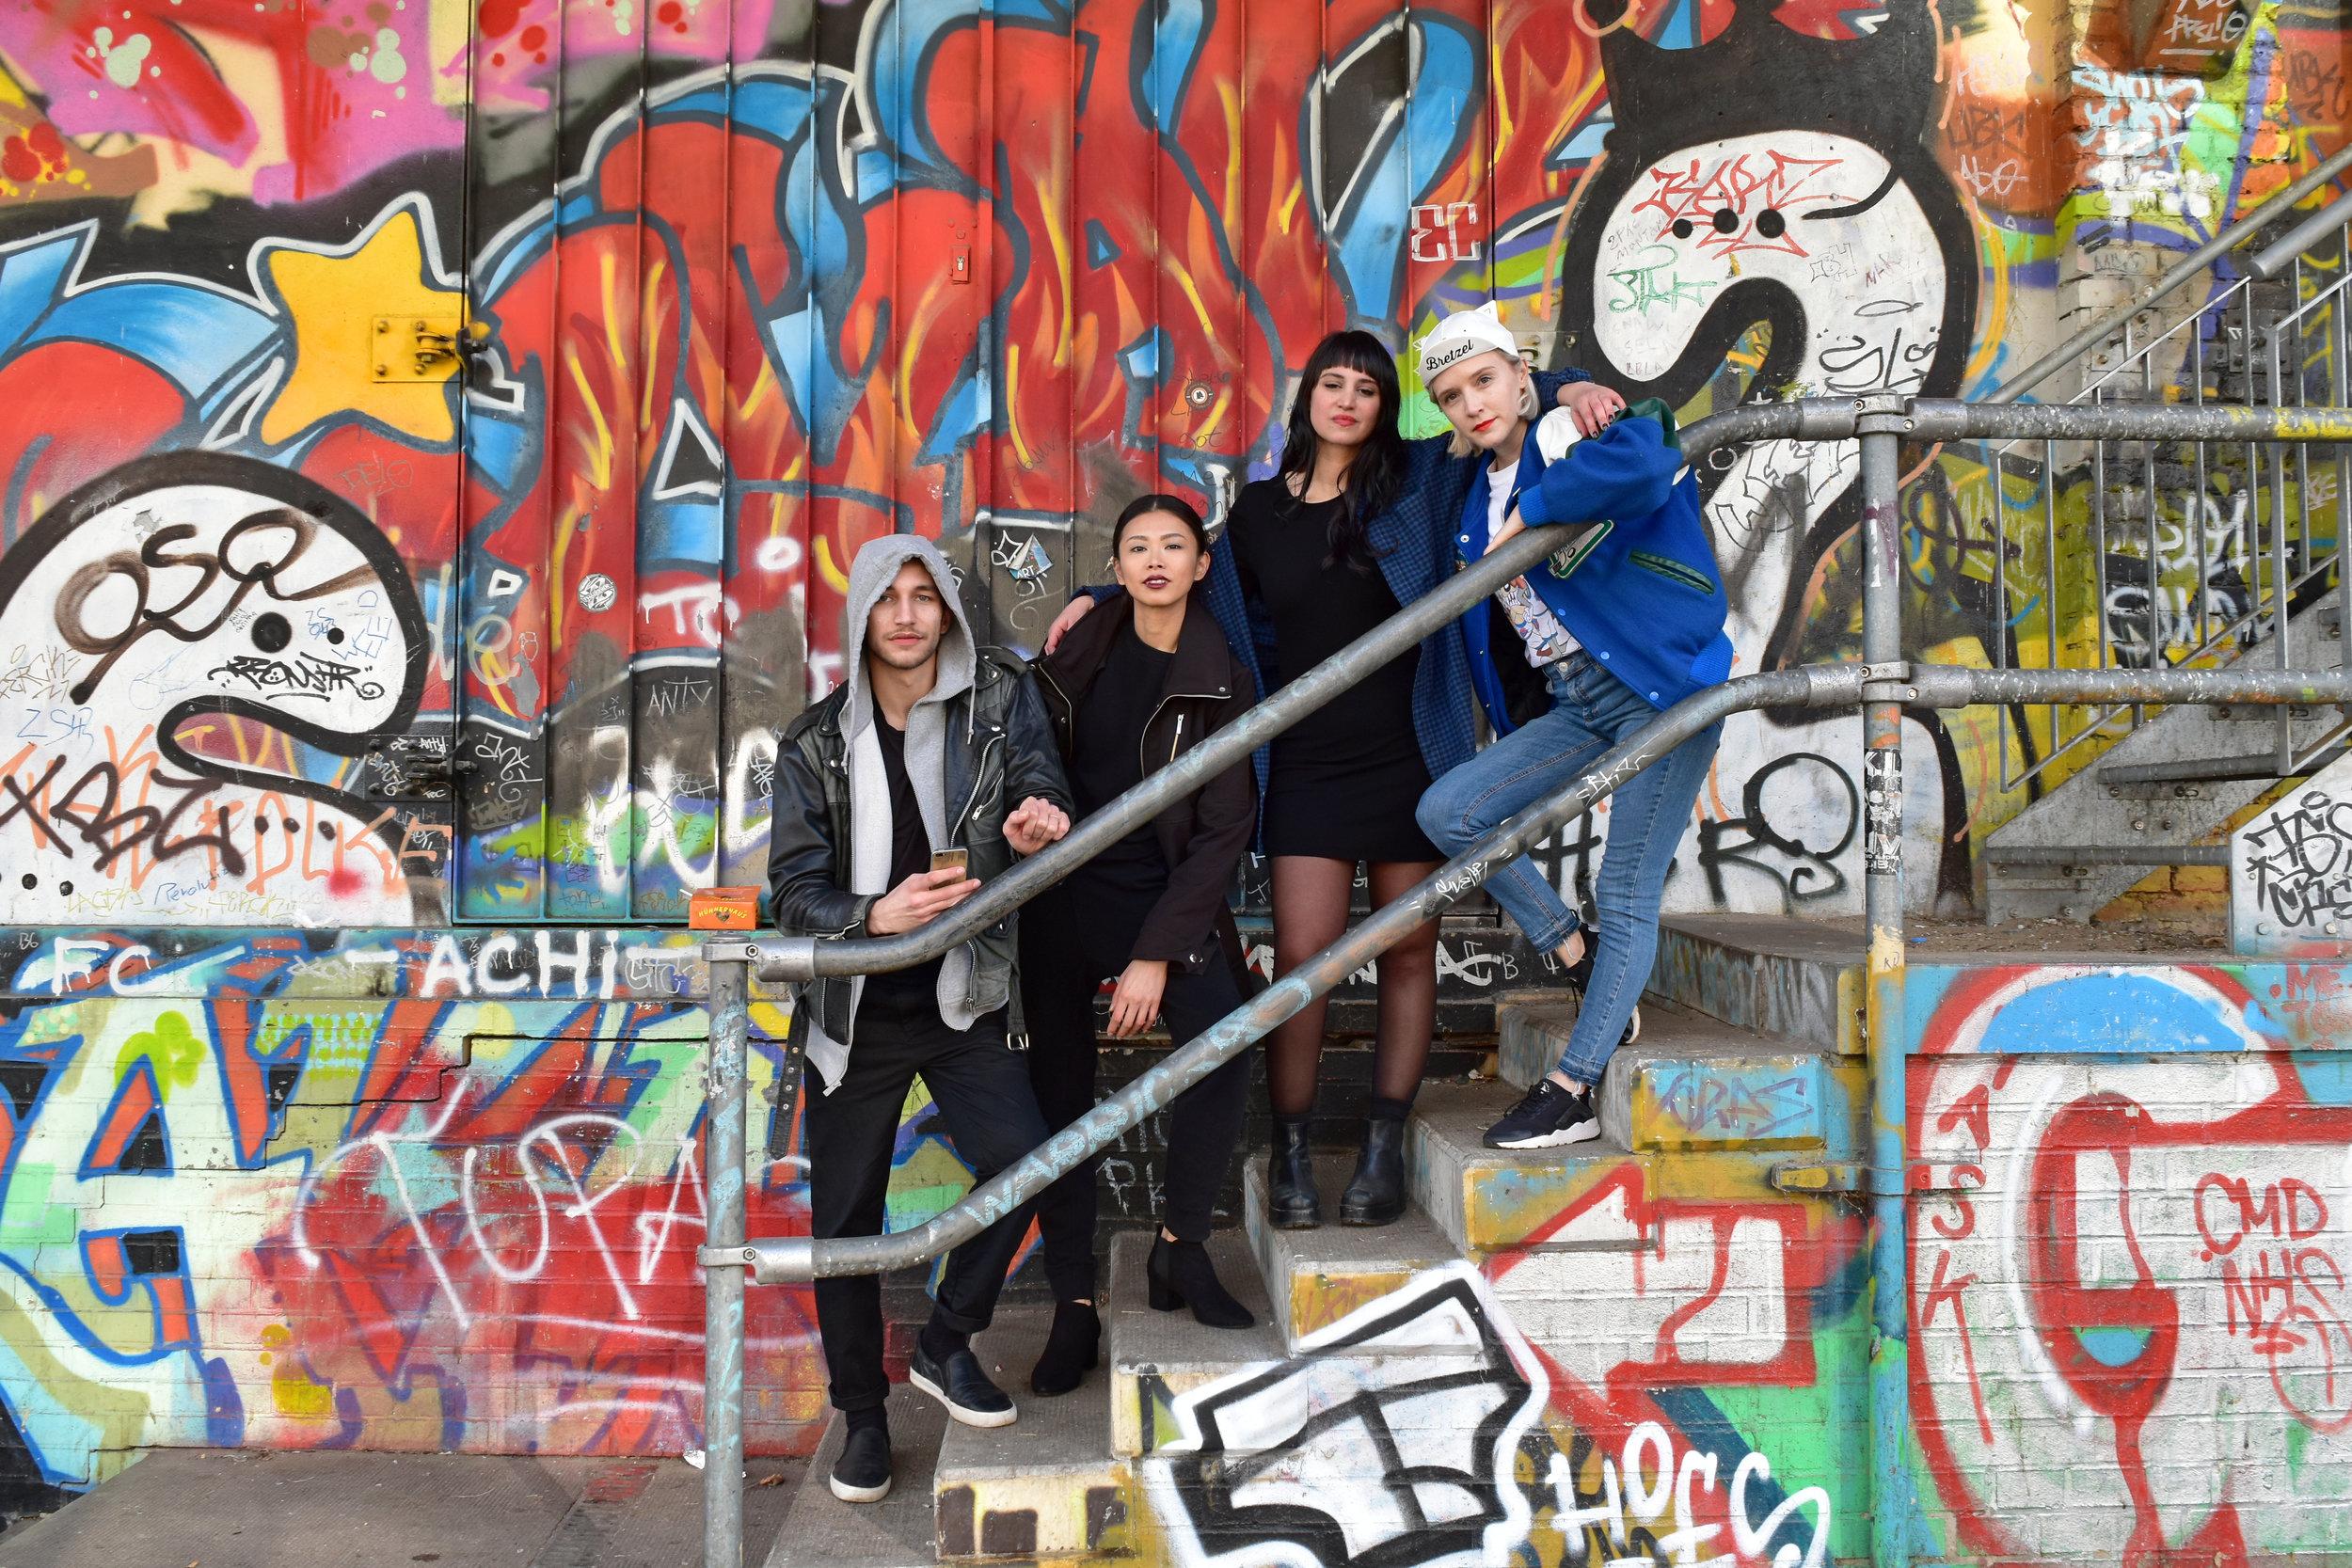 Behind the scenes, Berlin 2018